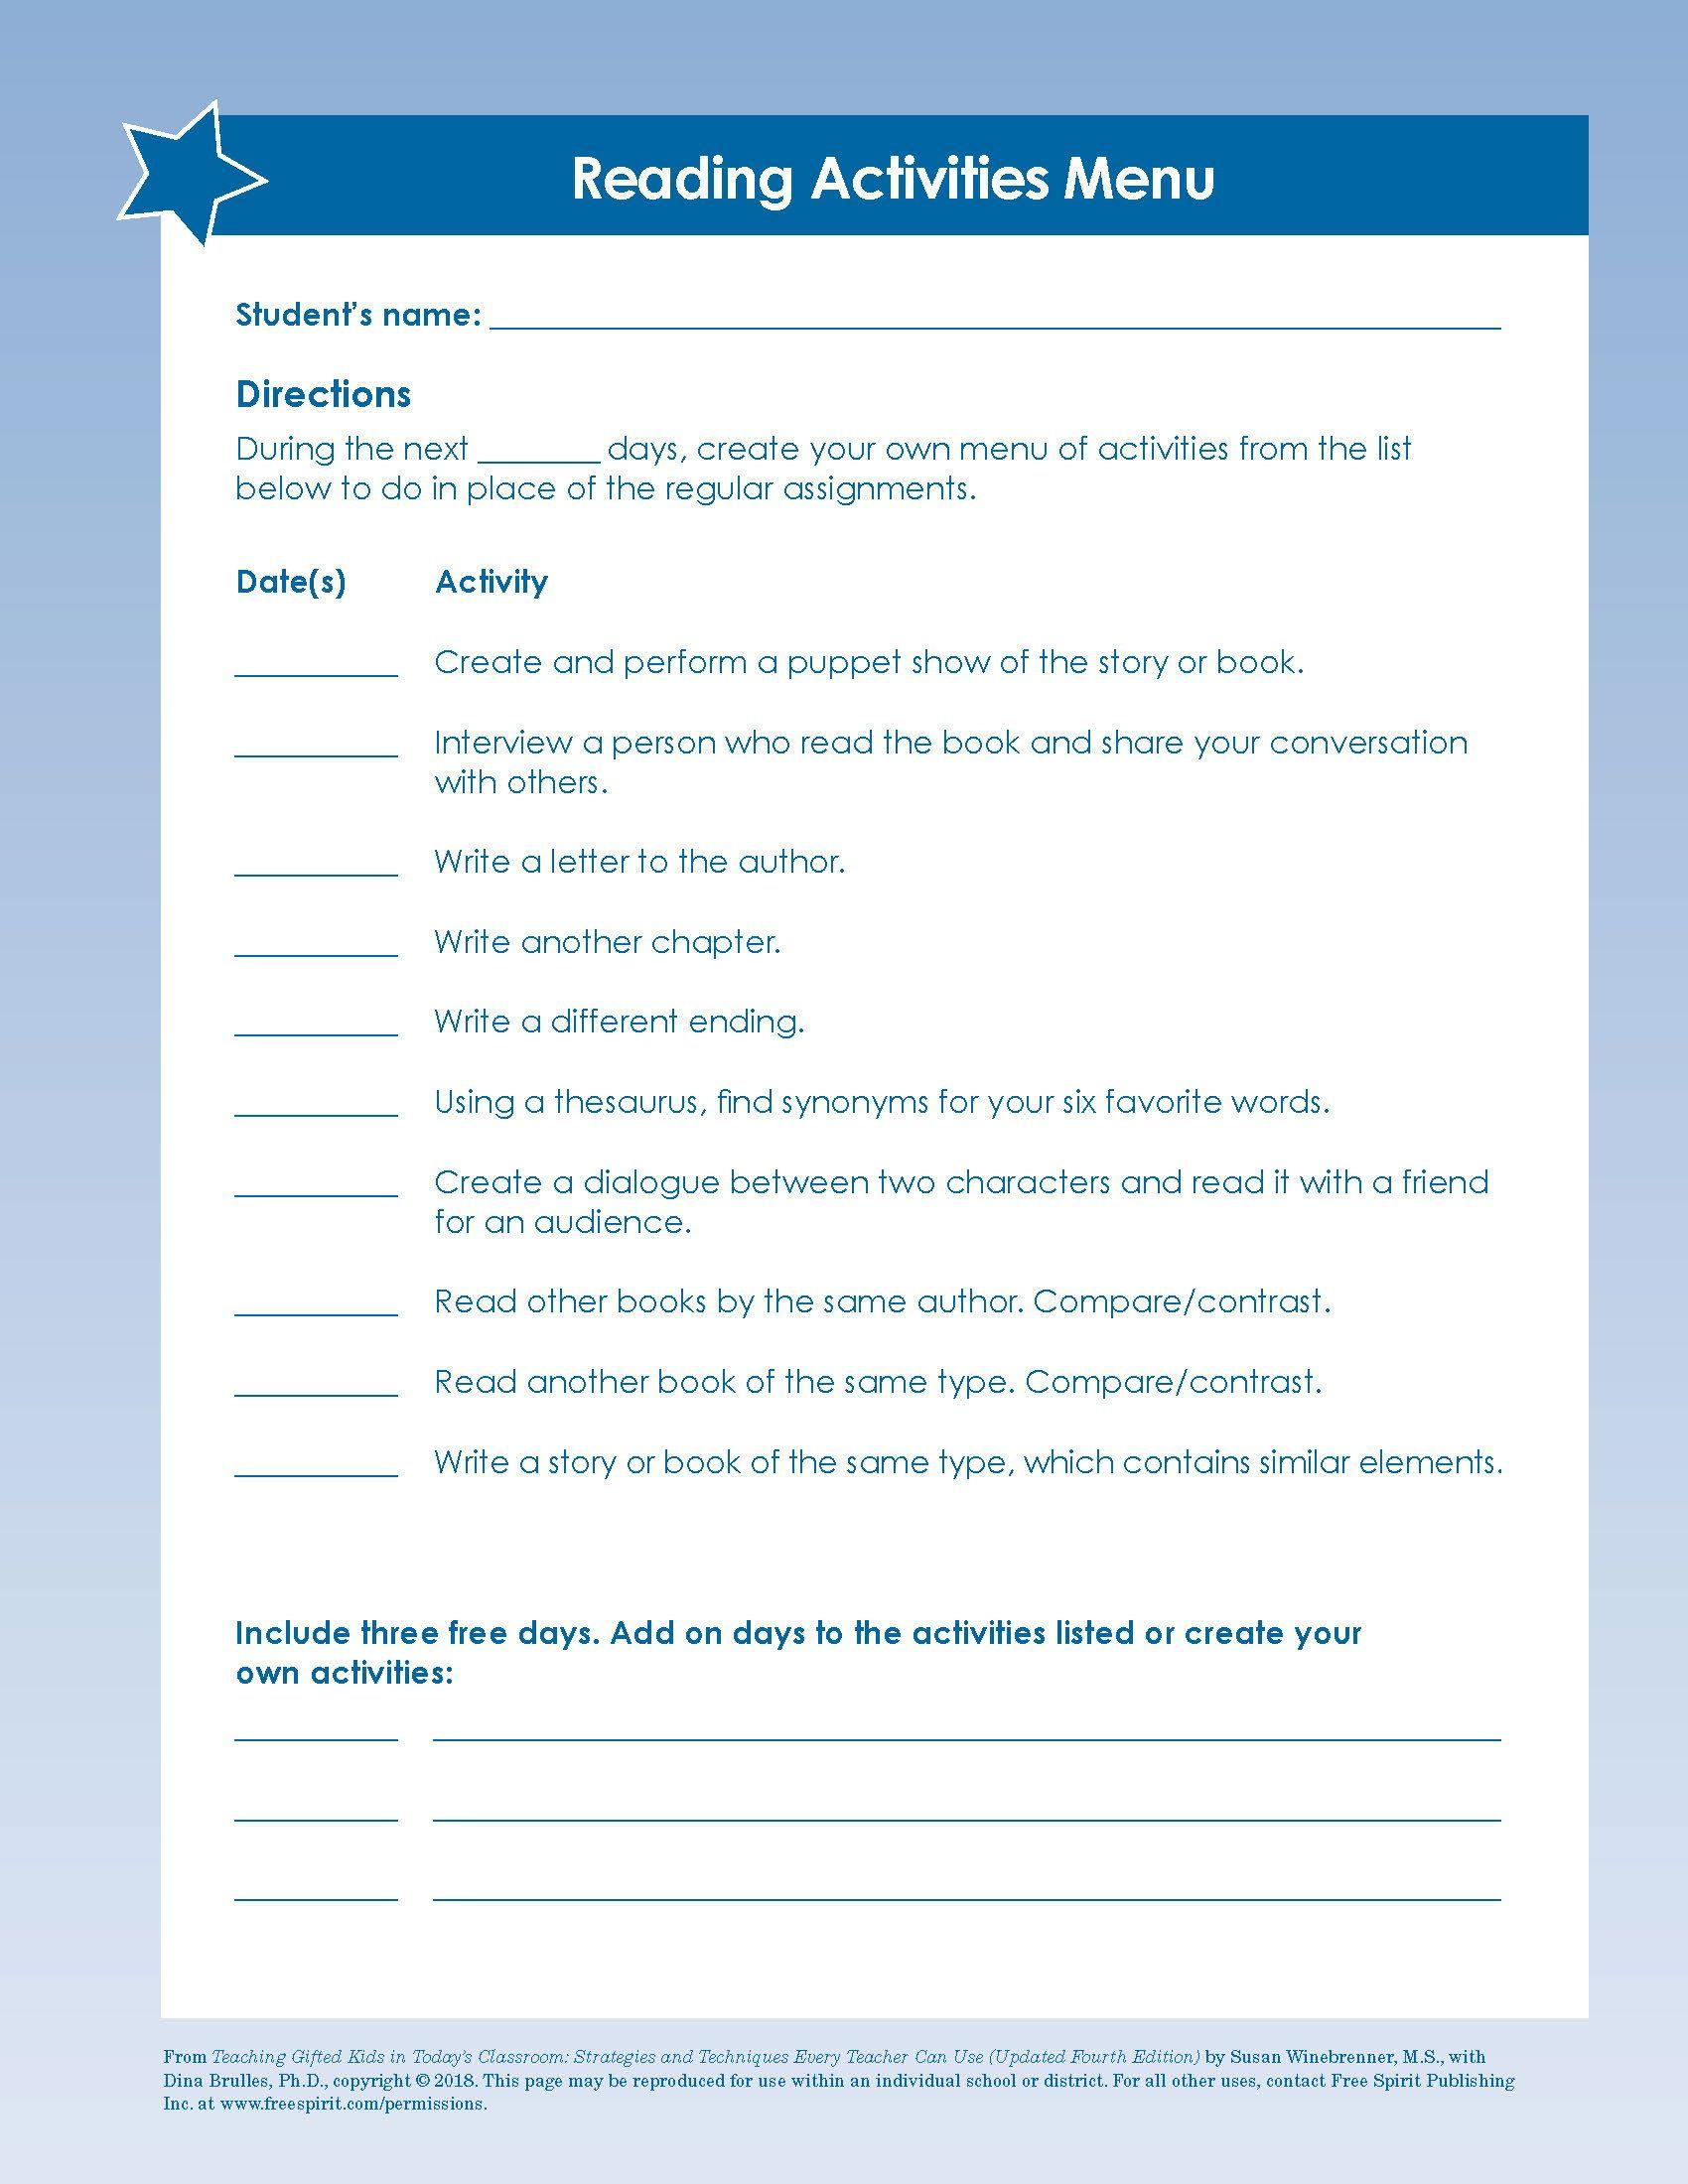 Free Download Reading Activities Menu A Printable